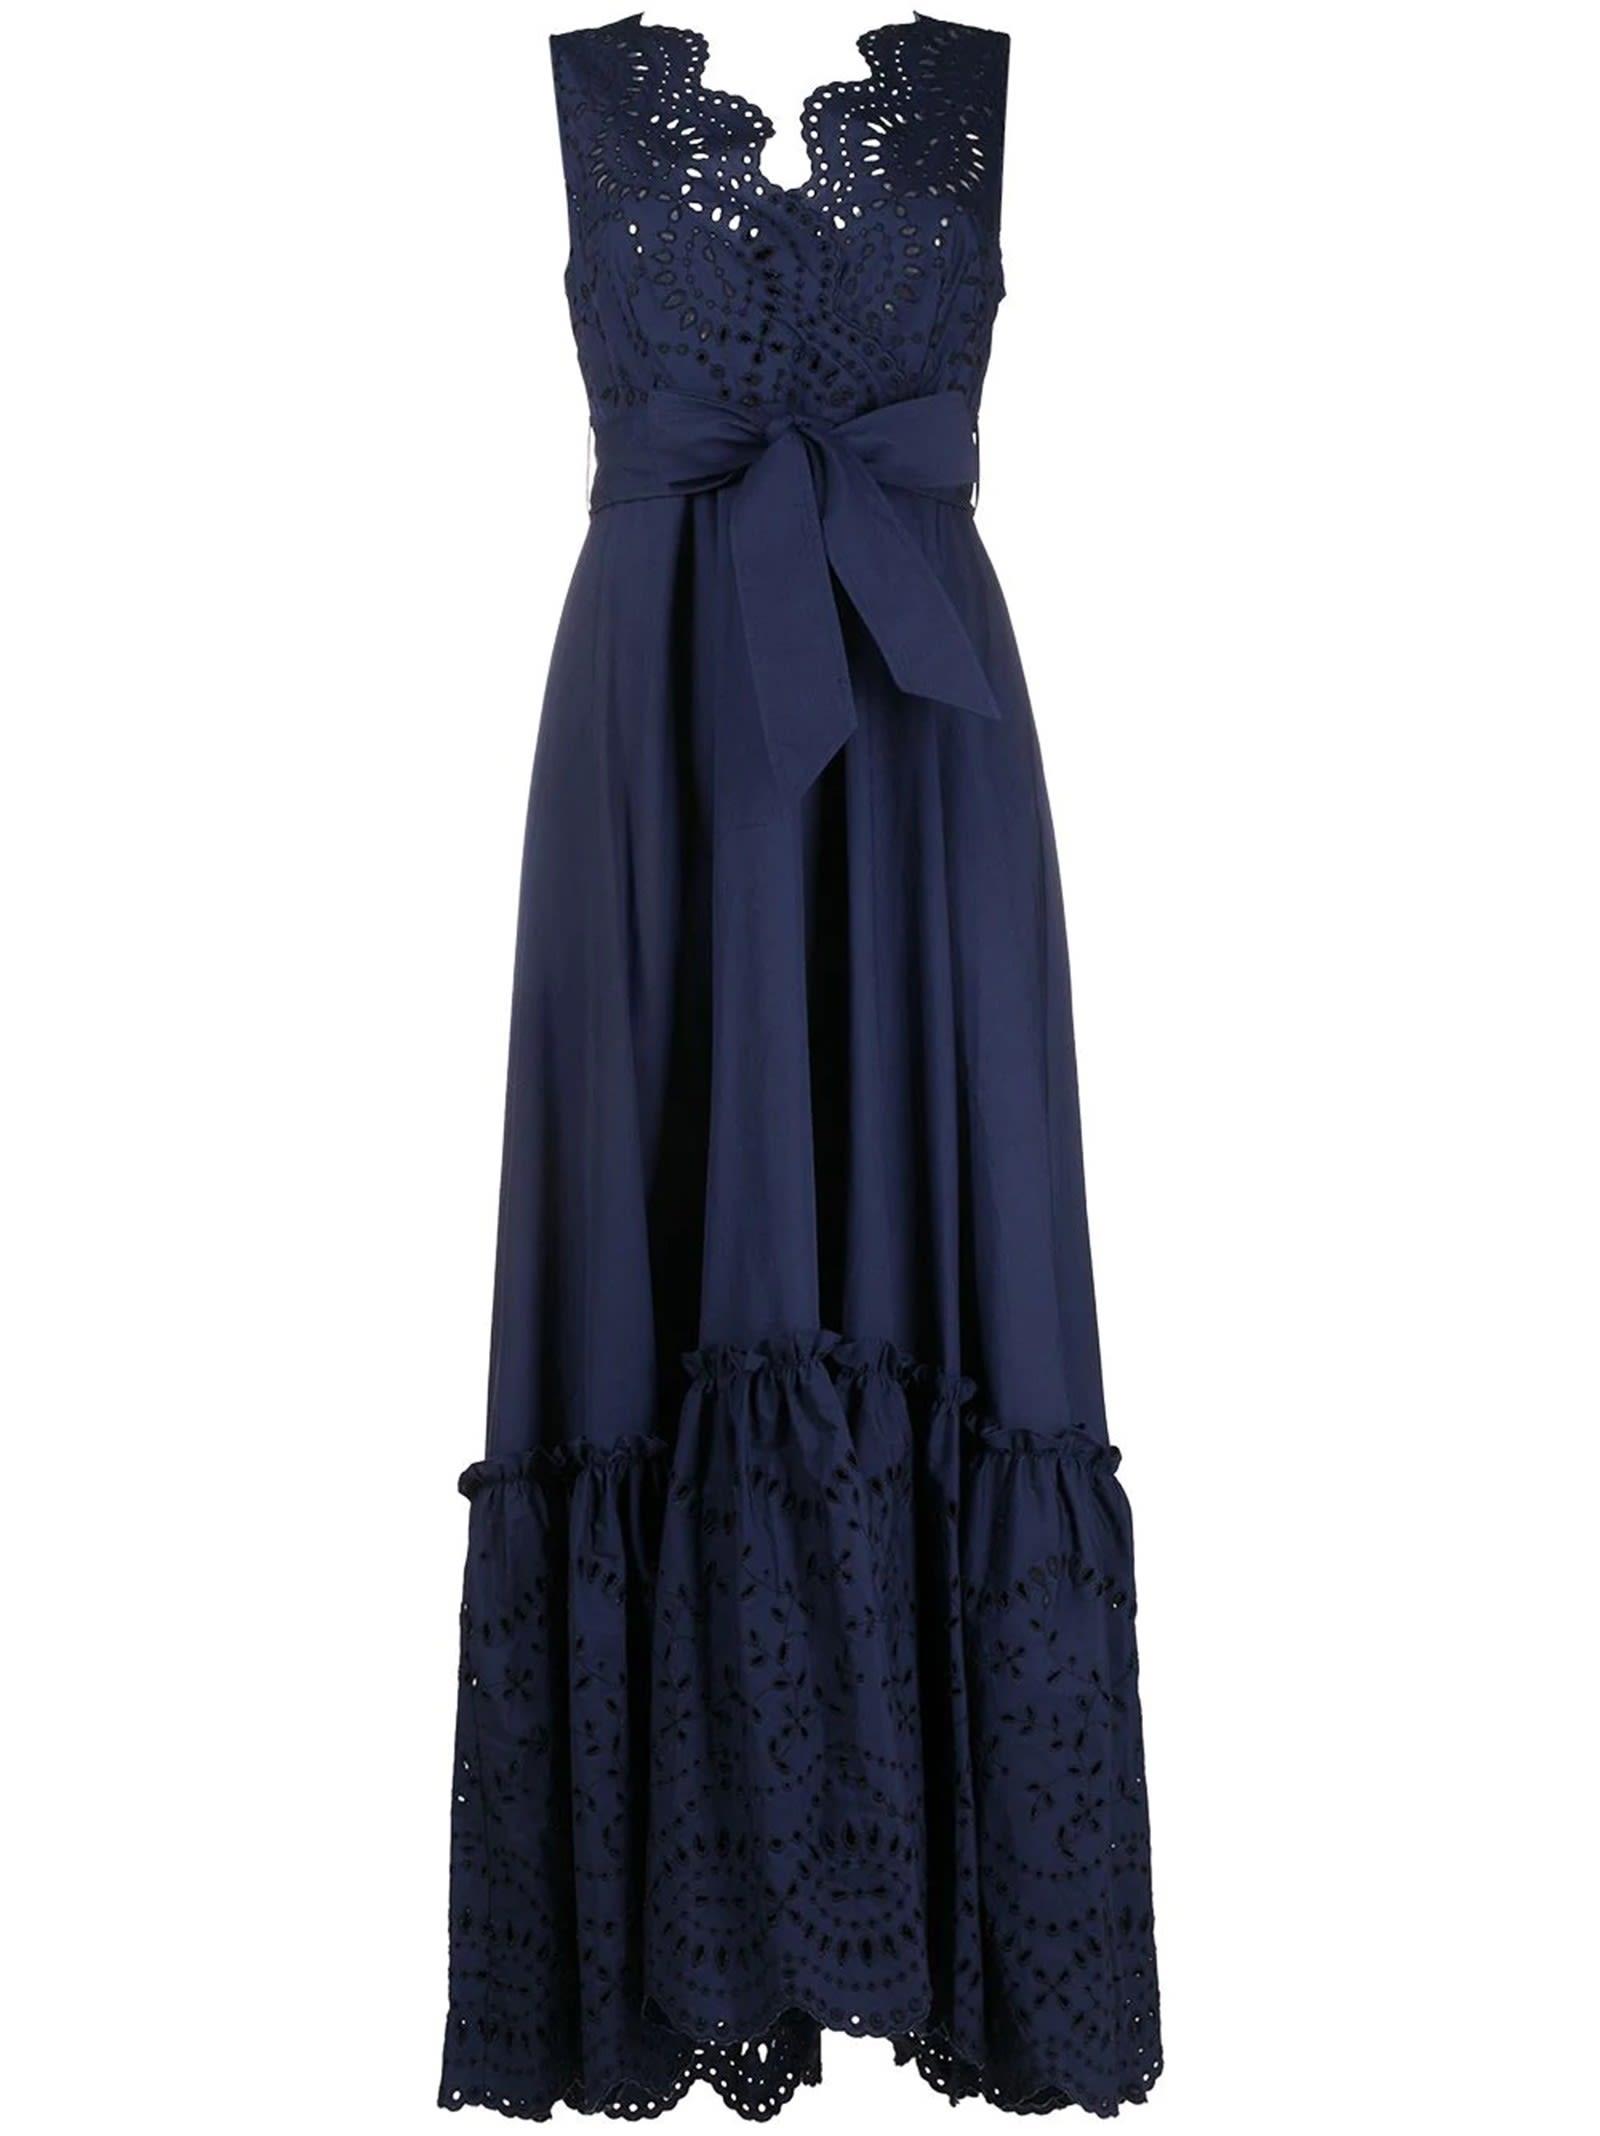 Buy Parosh D724089 Blue Cotton Cosan Broderie Anglais Dress online, shop Parosh with free shipping